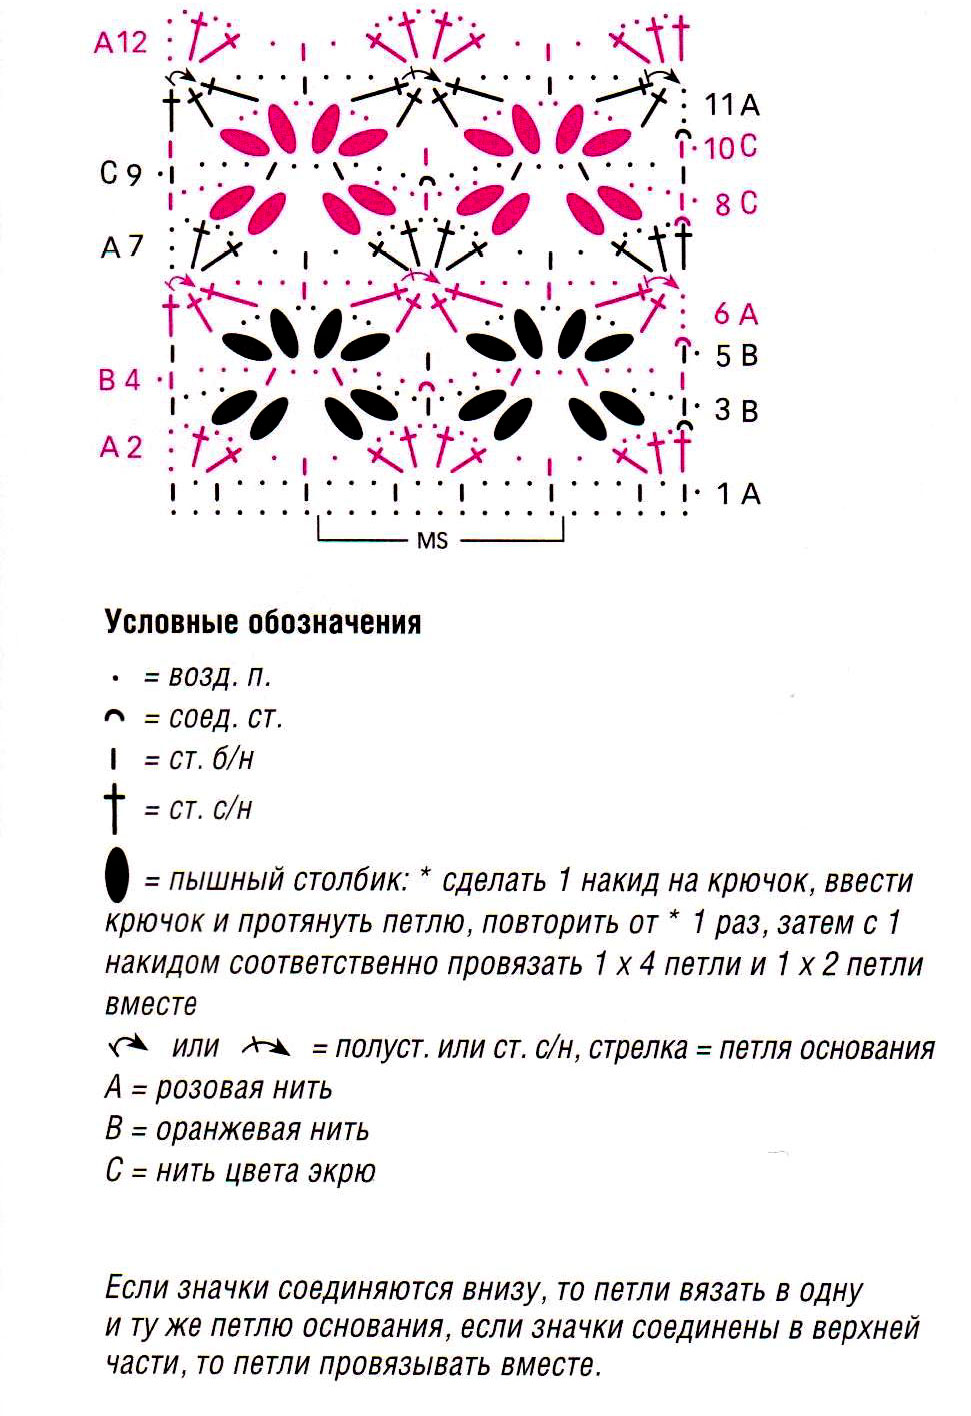 Схема узора ажурных цветков крючком